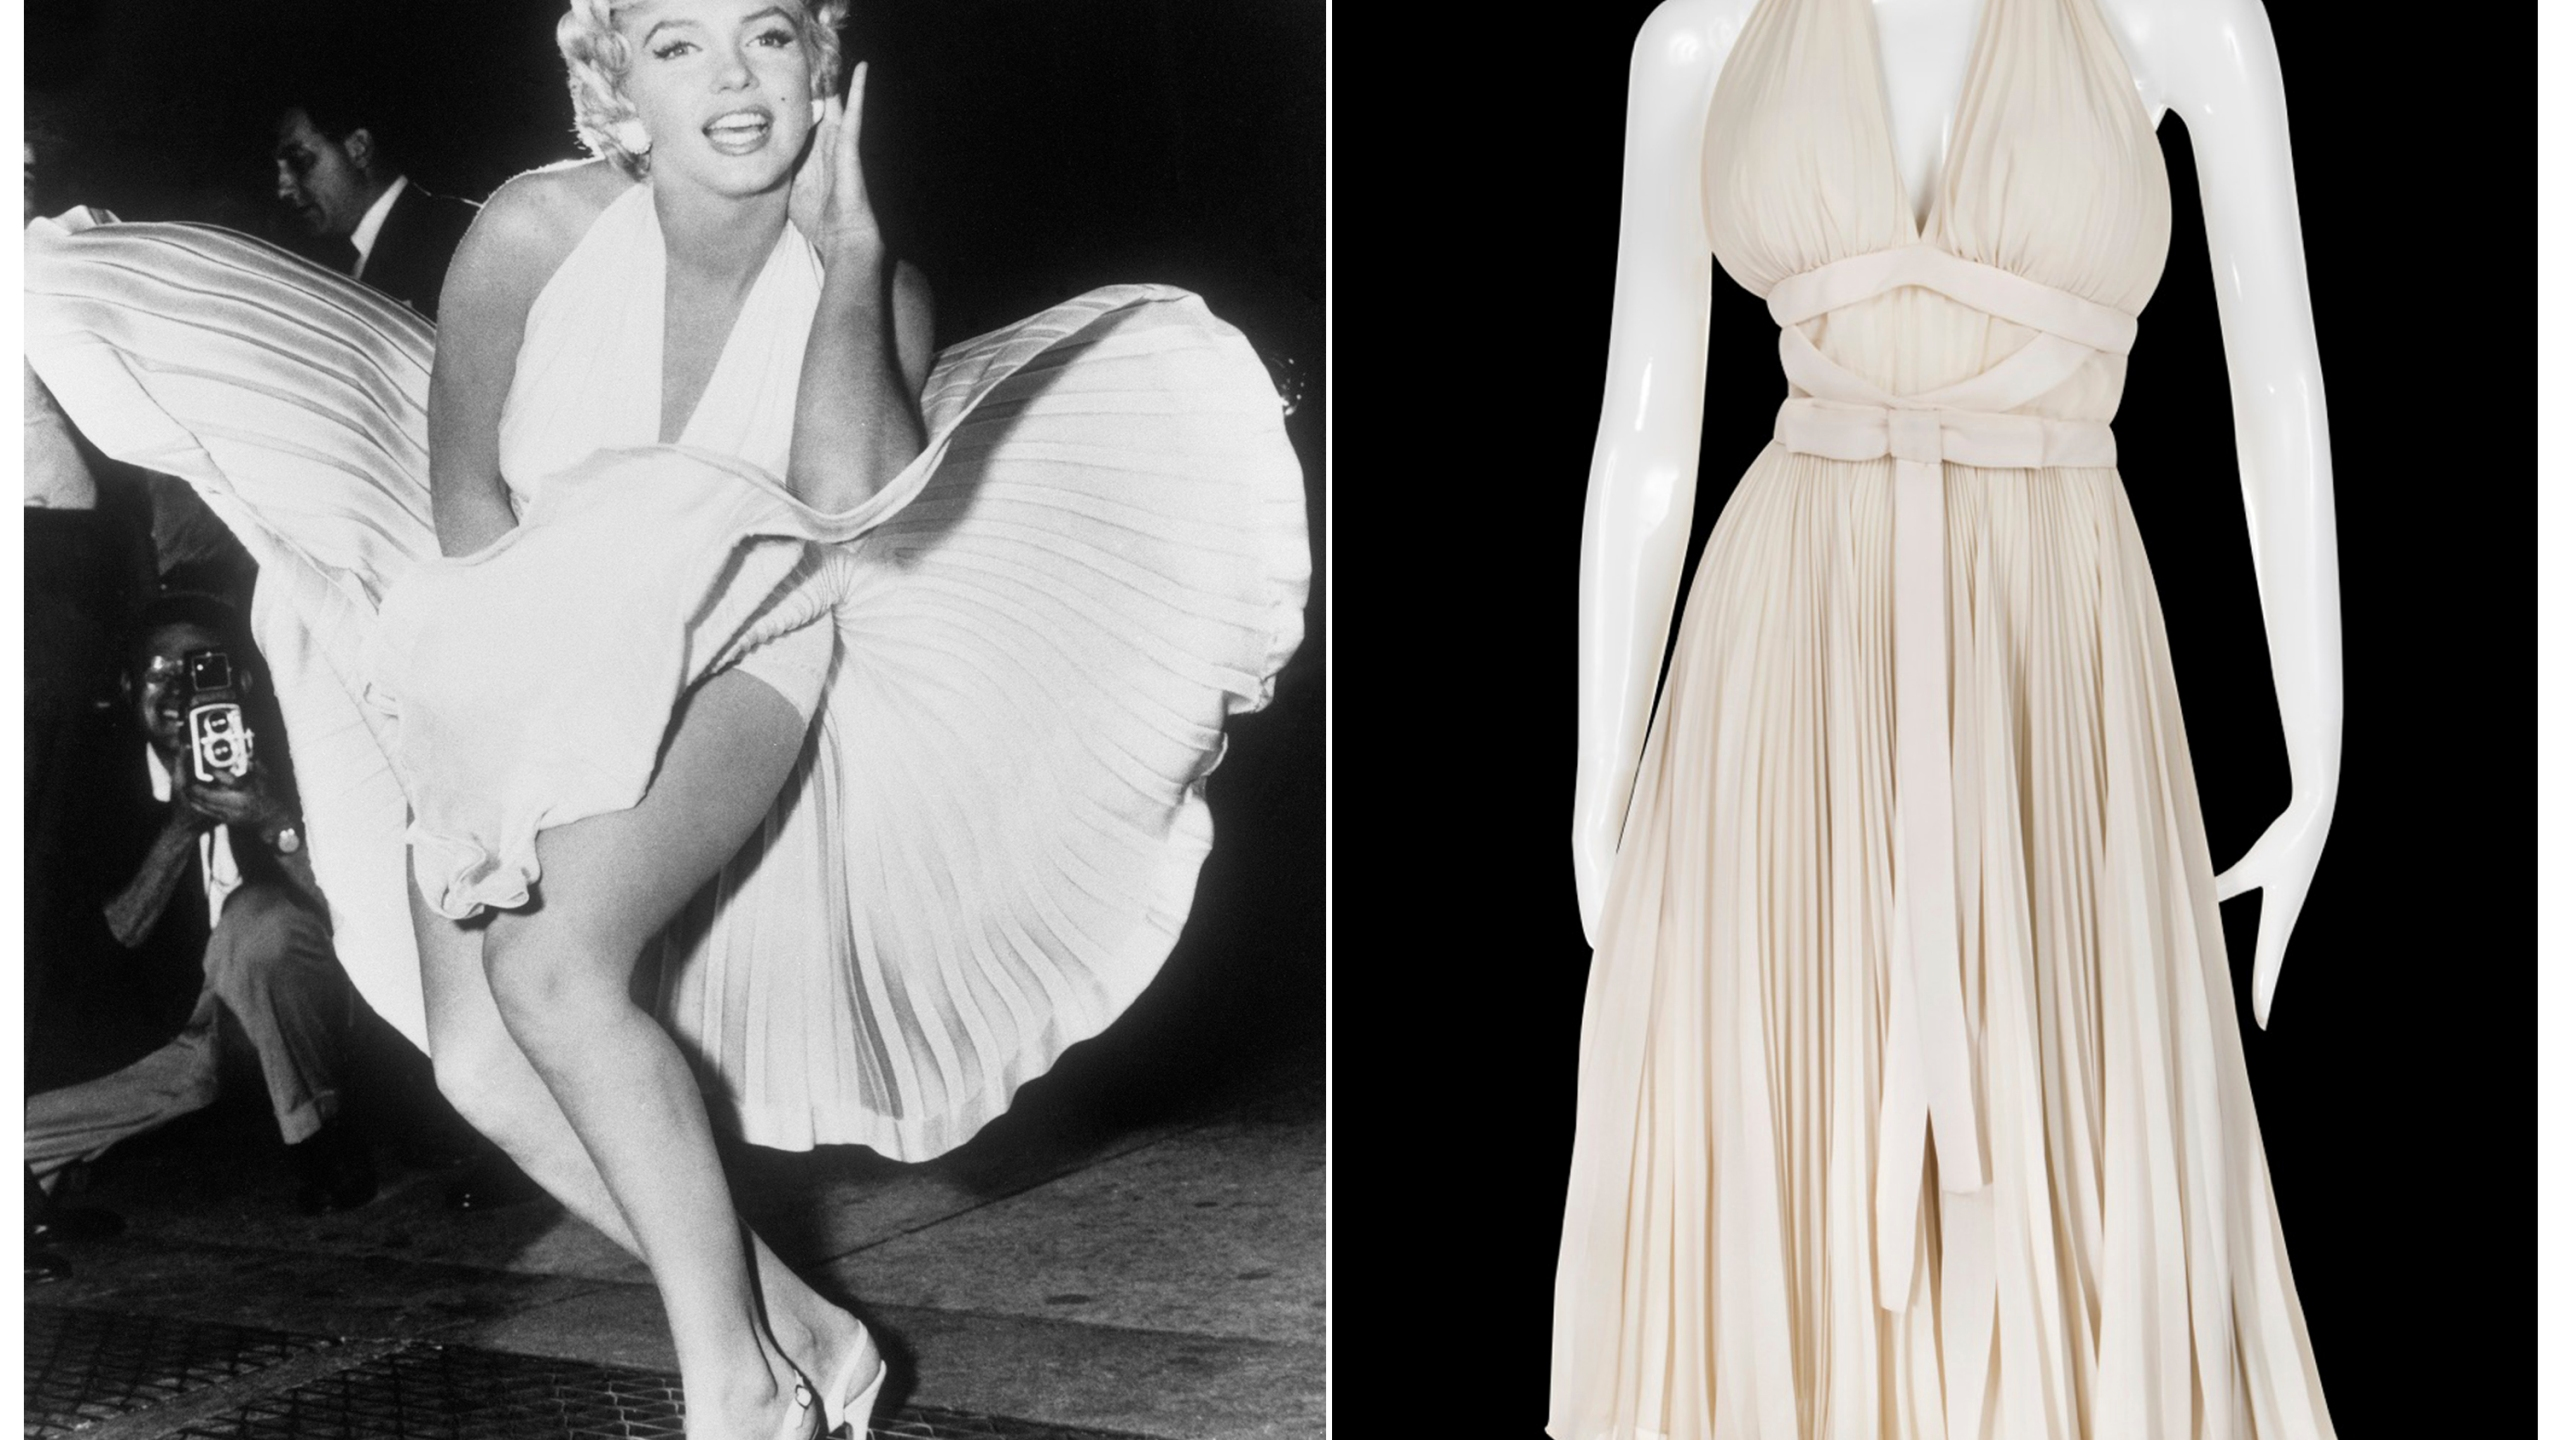 Marilyn_Monroe_Auction_26295-159532.jpg87434488